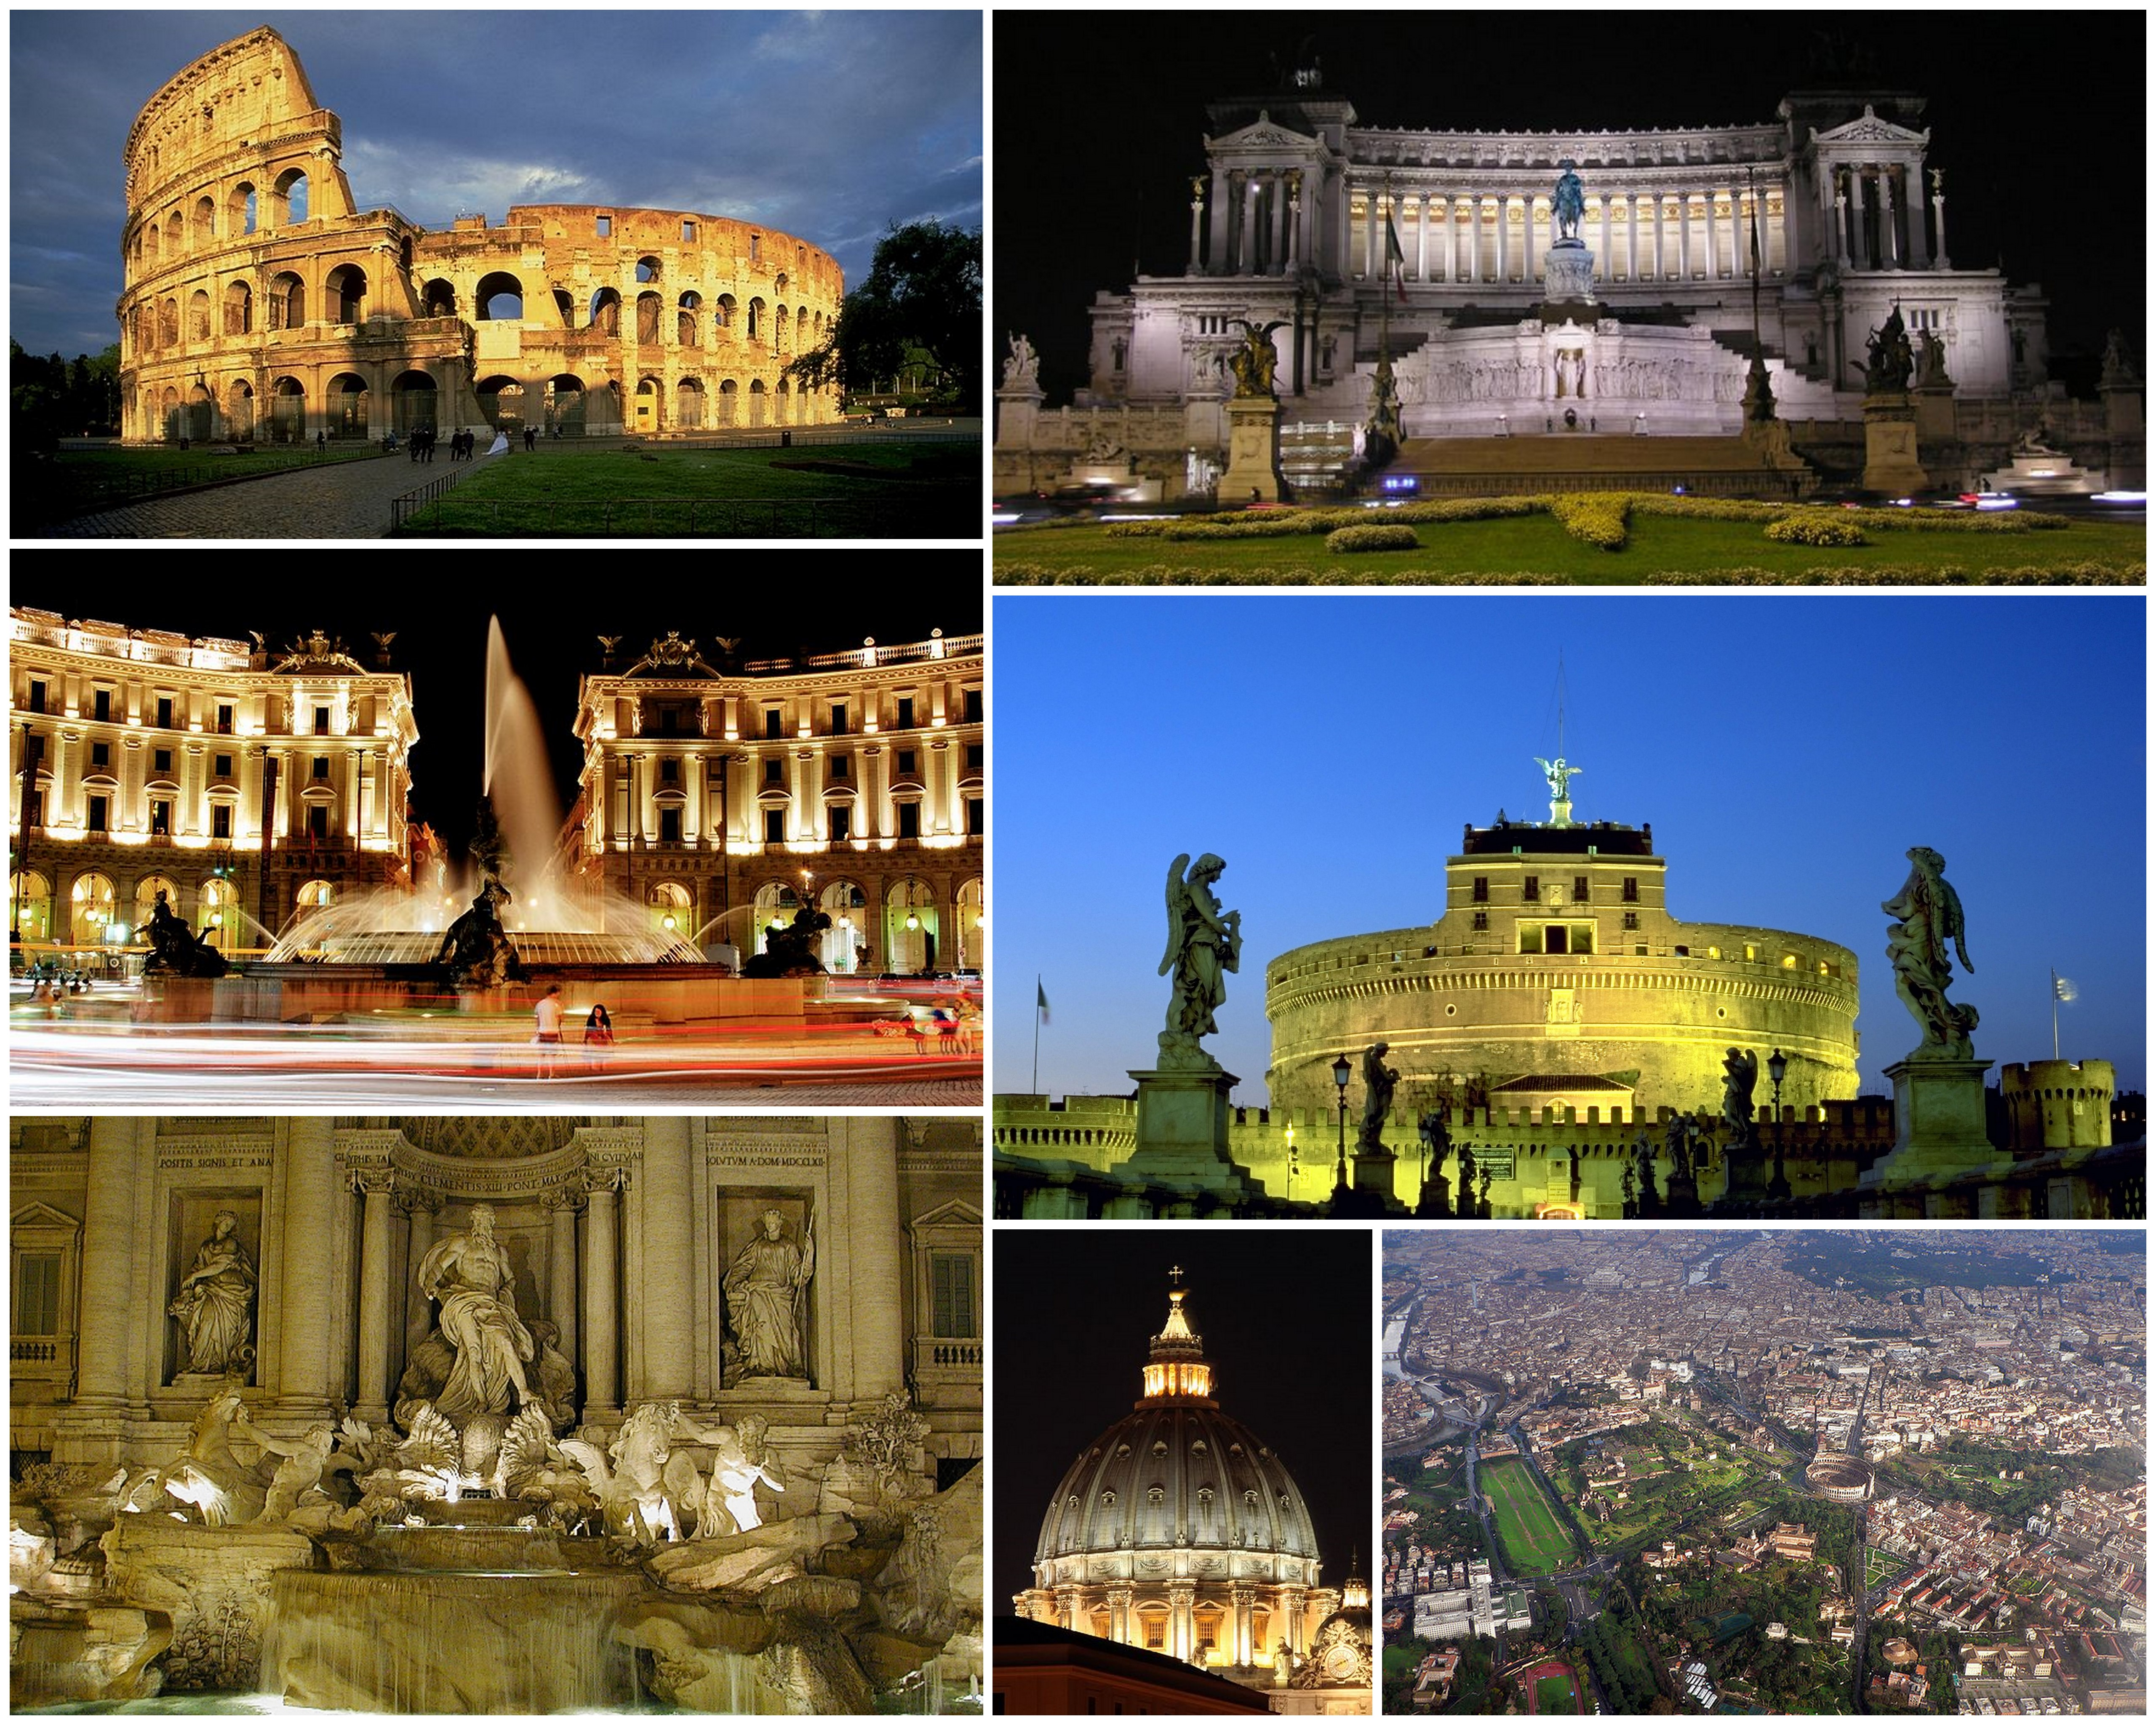 http://upload.wikimedia.org/wikipedia/commons/7/75/Collage_Rome.jpg?uselang=ru.JPEG